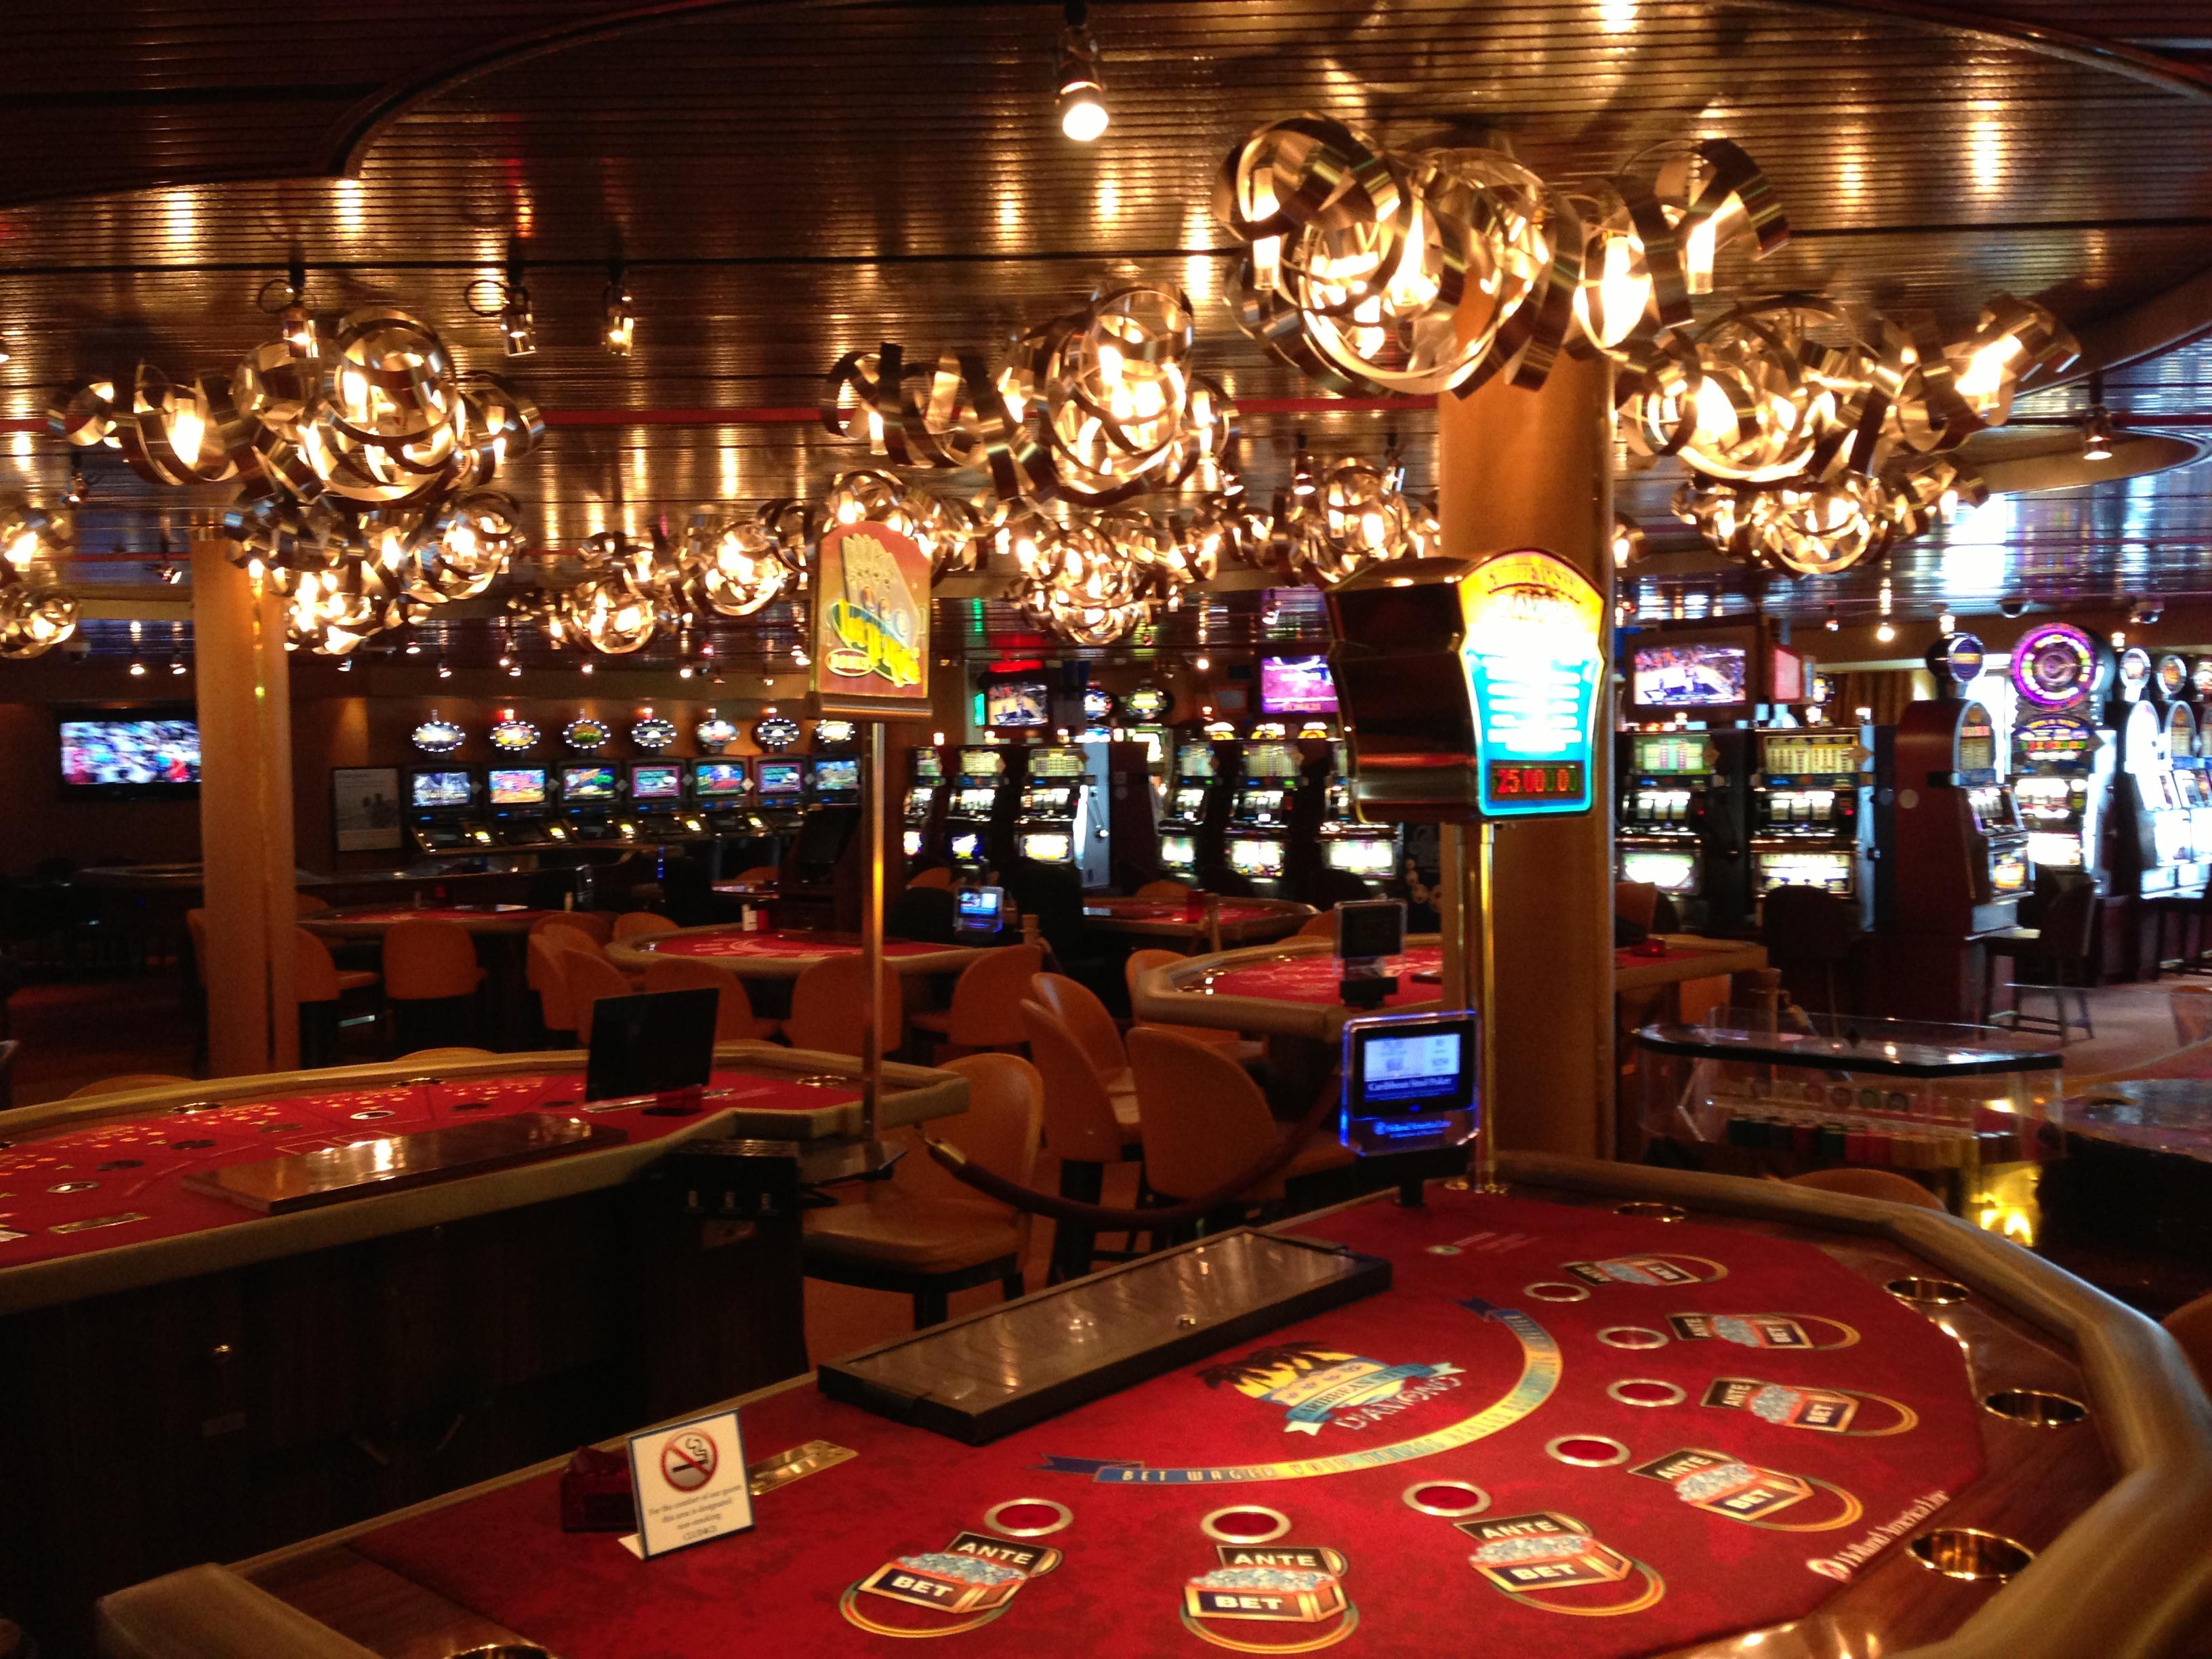 Gambling on holland america